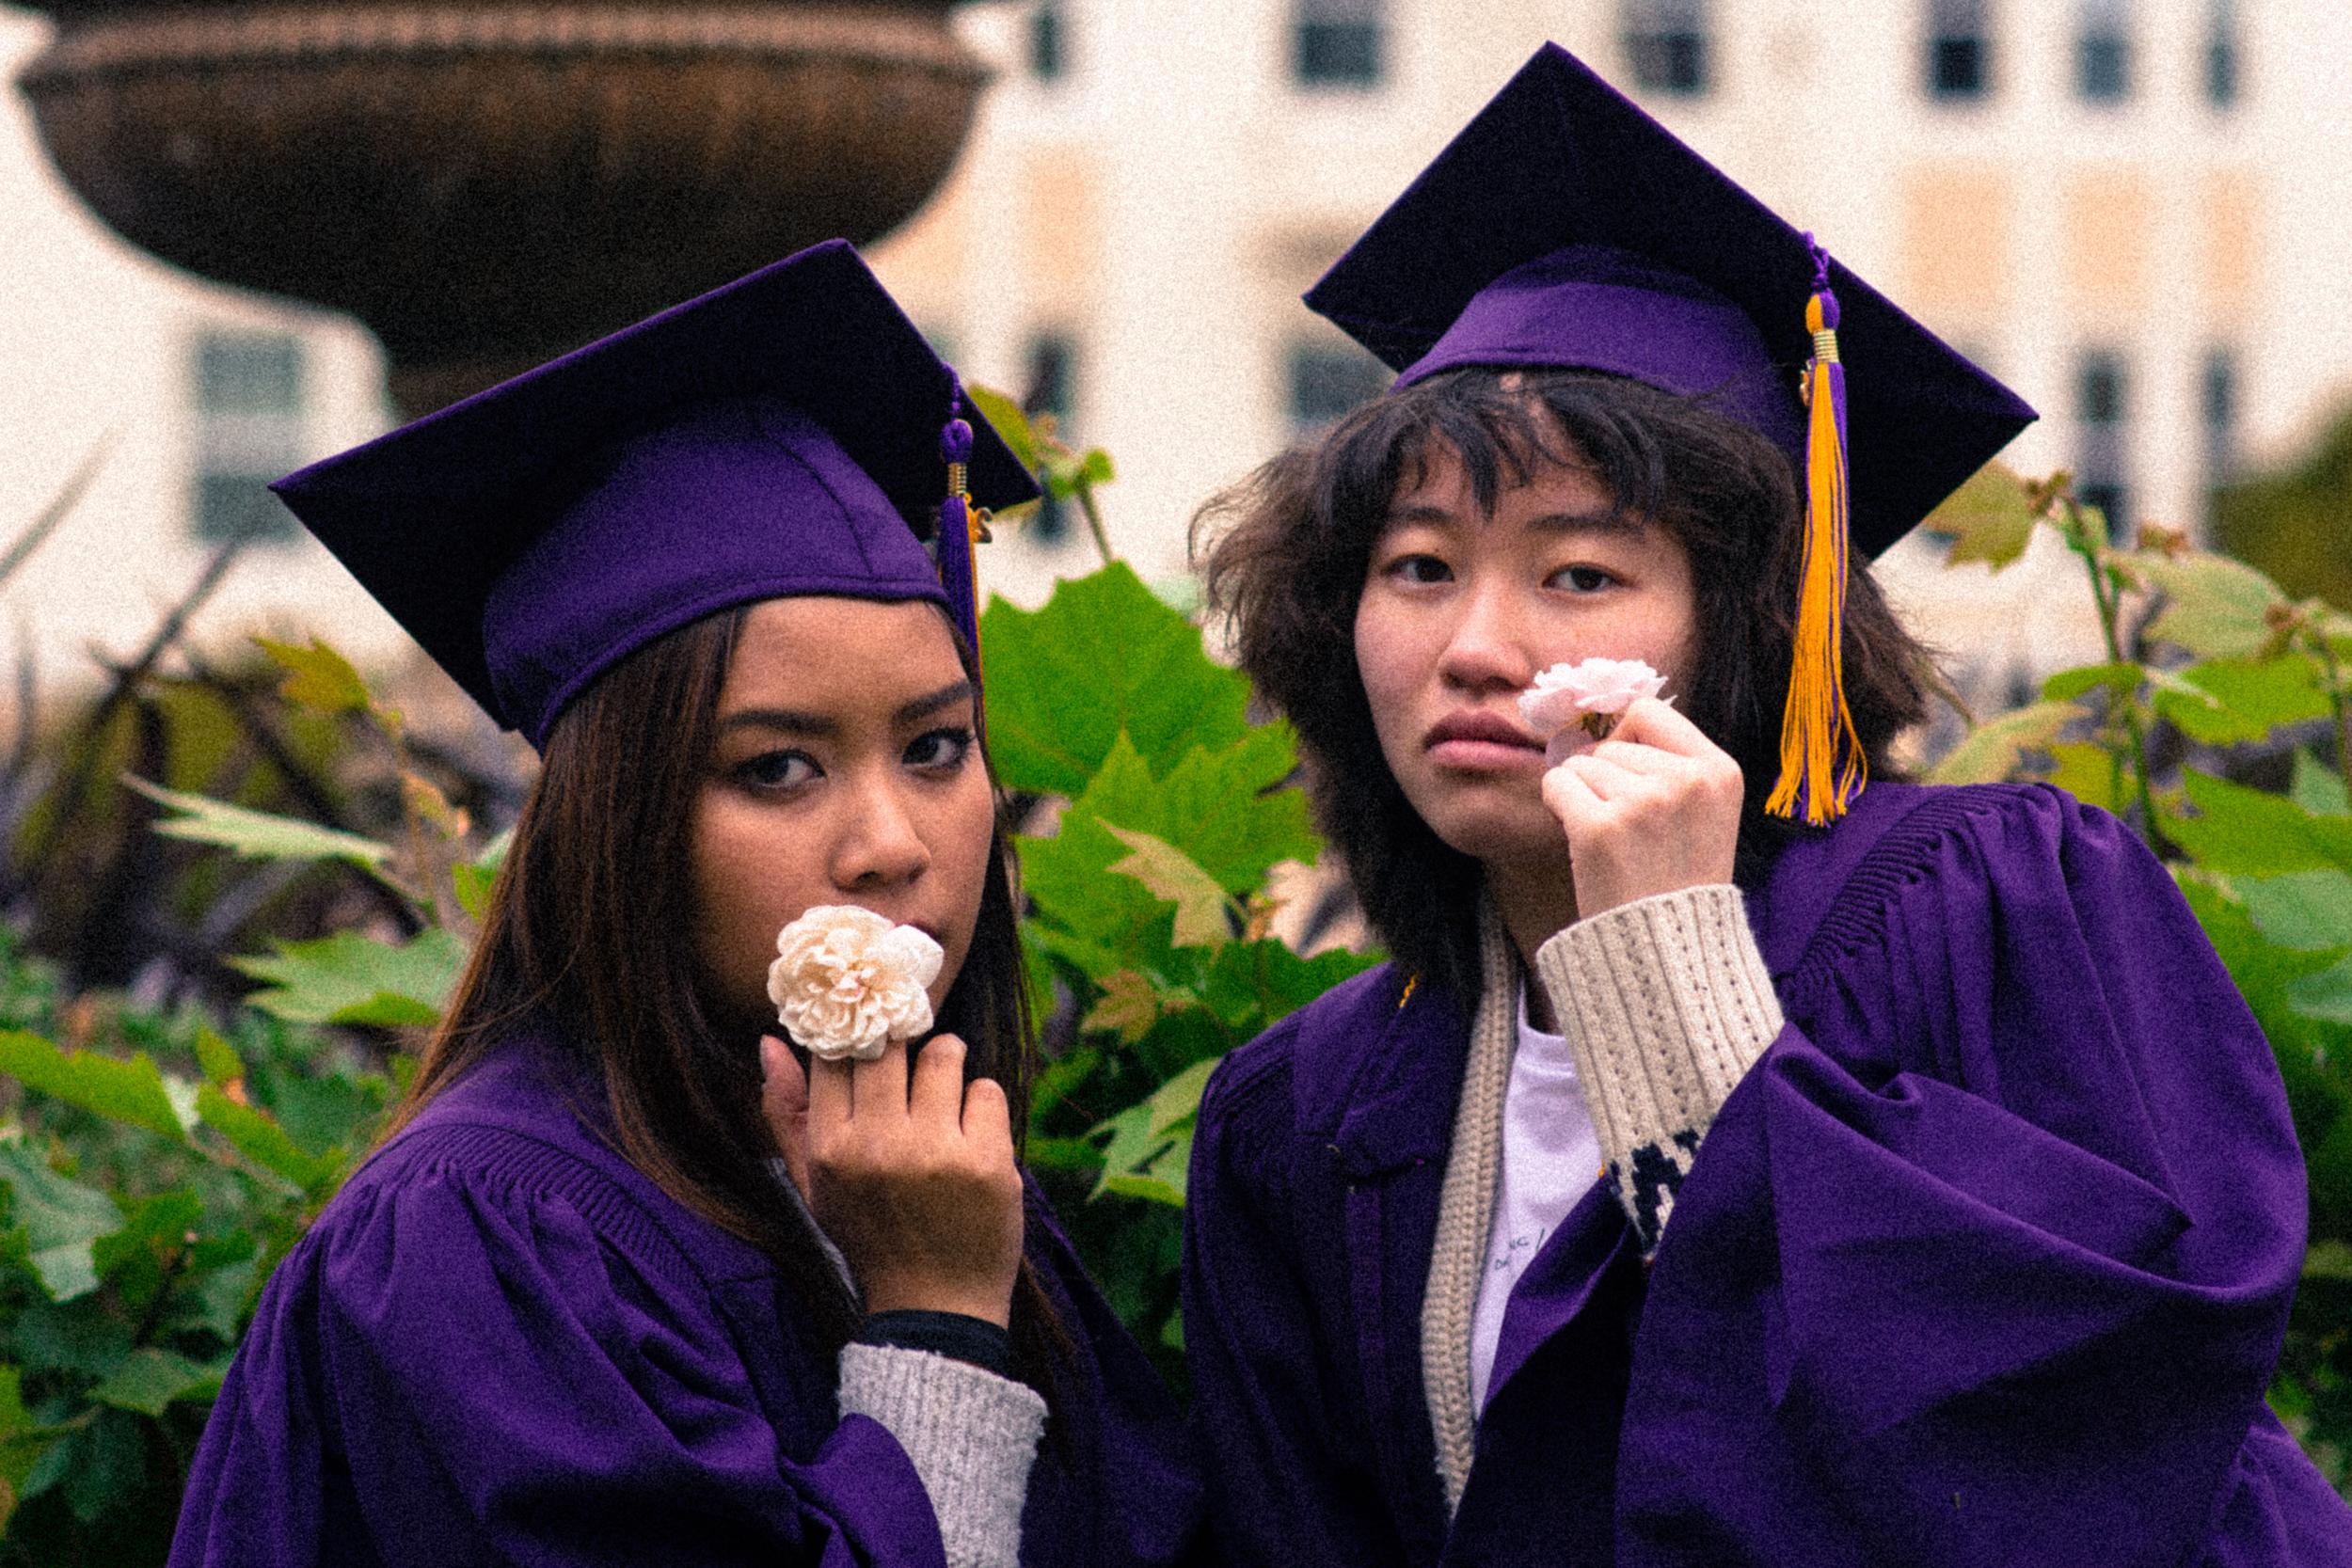 An Avant-Garde Graduation